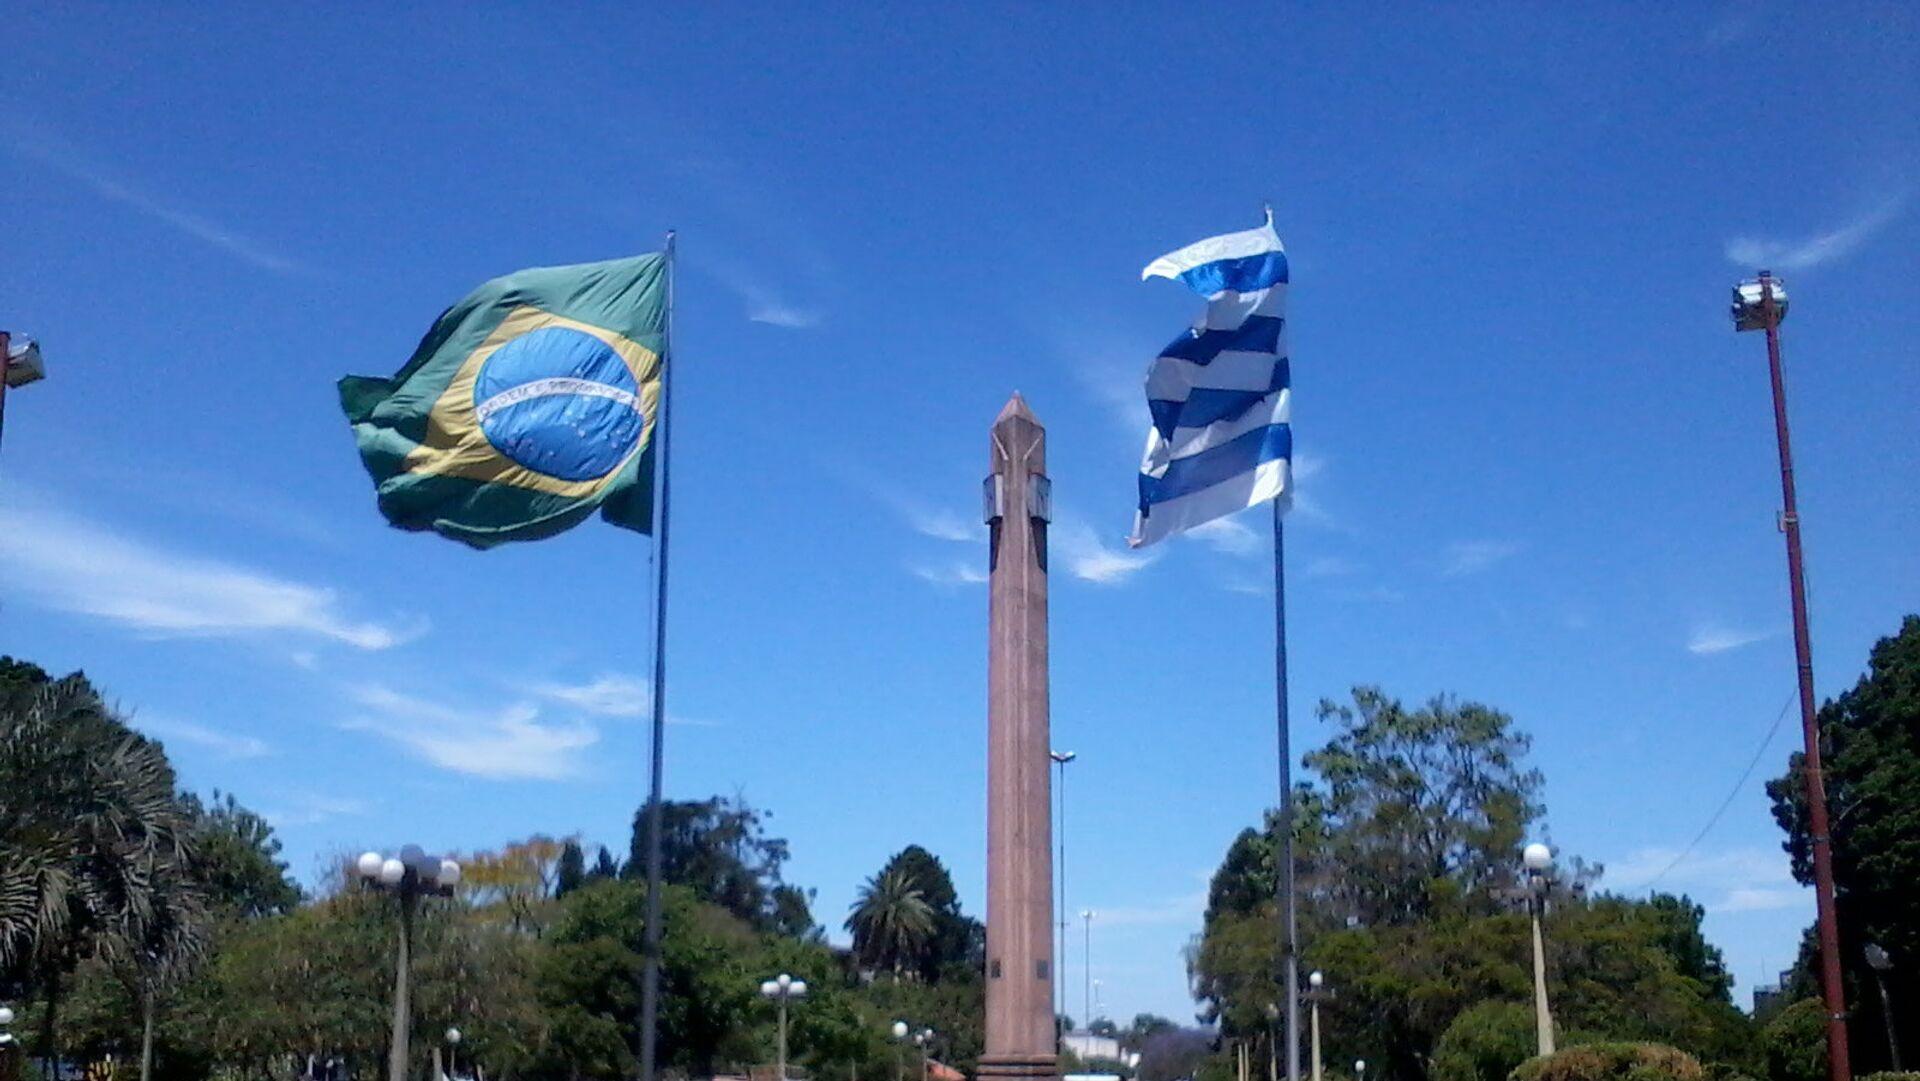 Frontera de la Paz entre Uruguay y Brasil, plaza internacional de Rivera-Santana do Livramento. - Sputnik Mundo, 1920, 09.03.2021